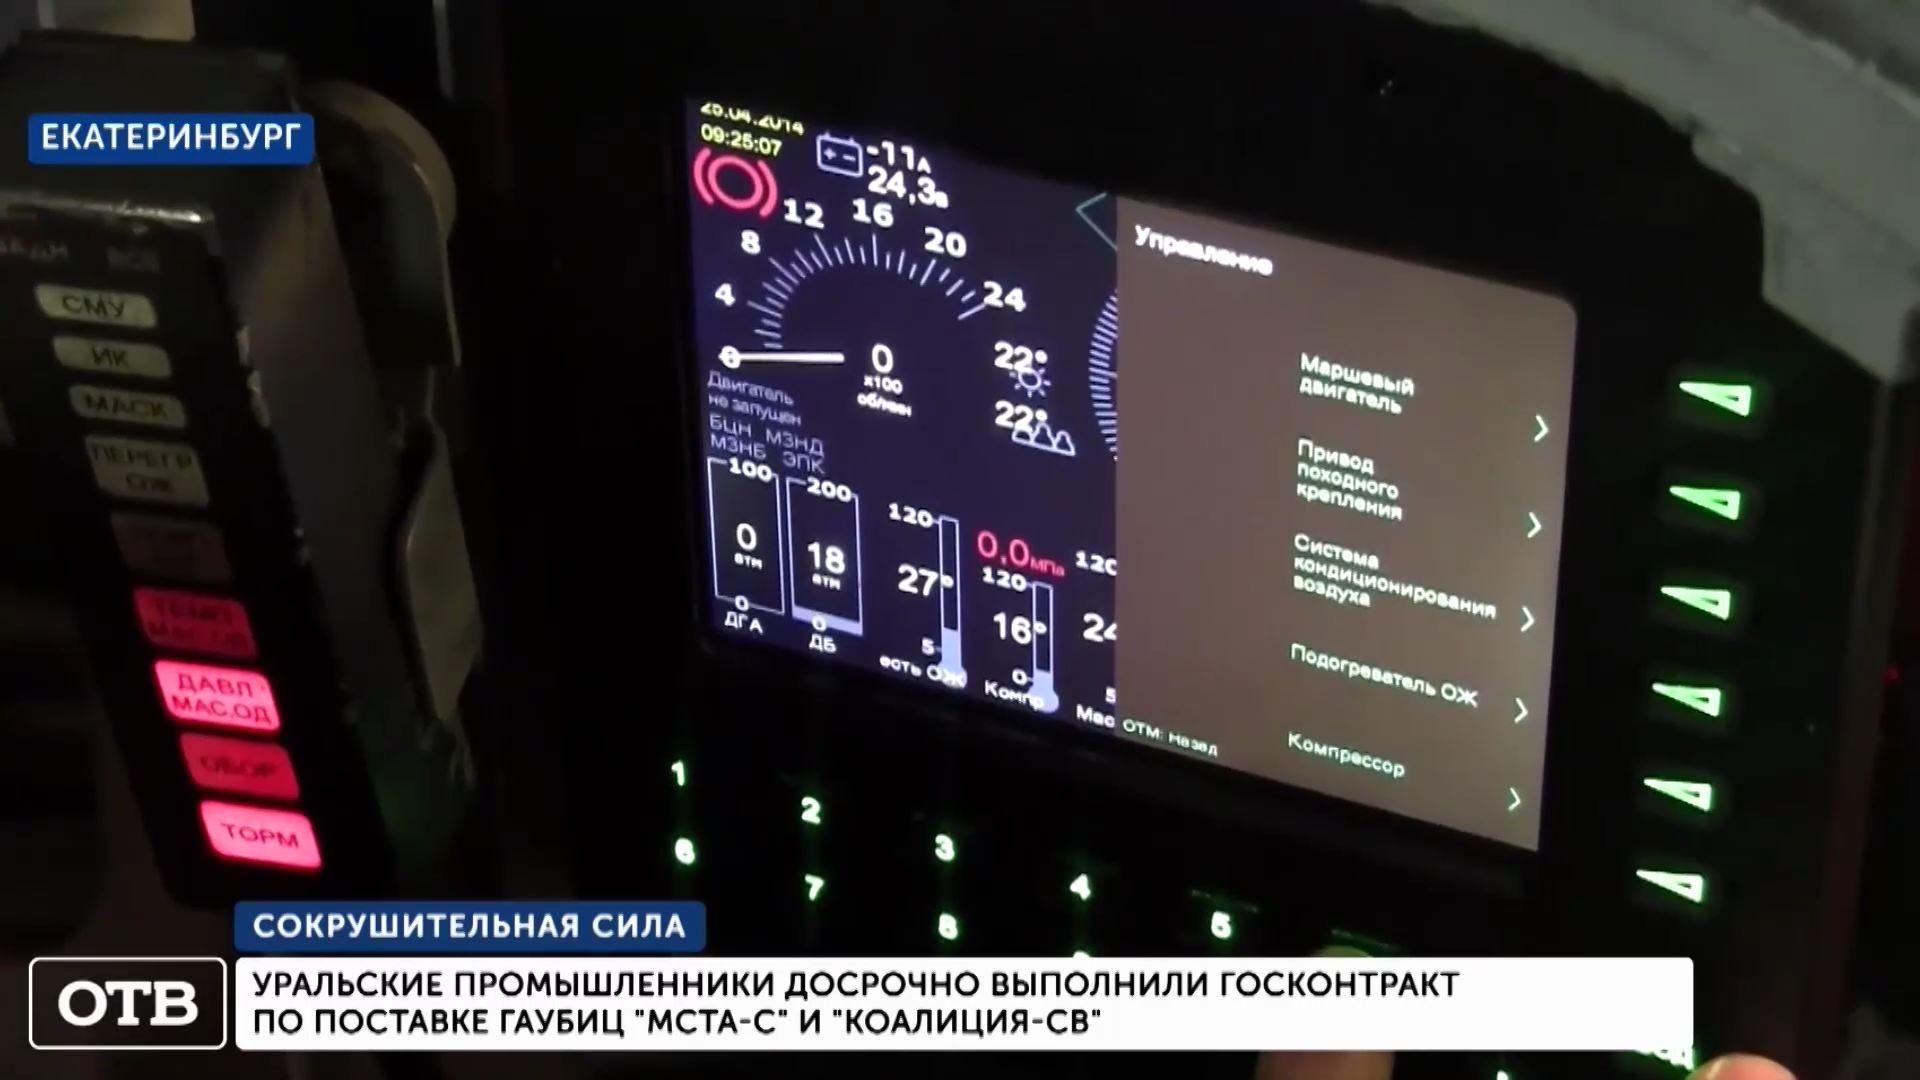 Uraltransmash-mp4-000097040